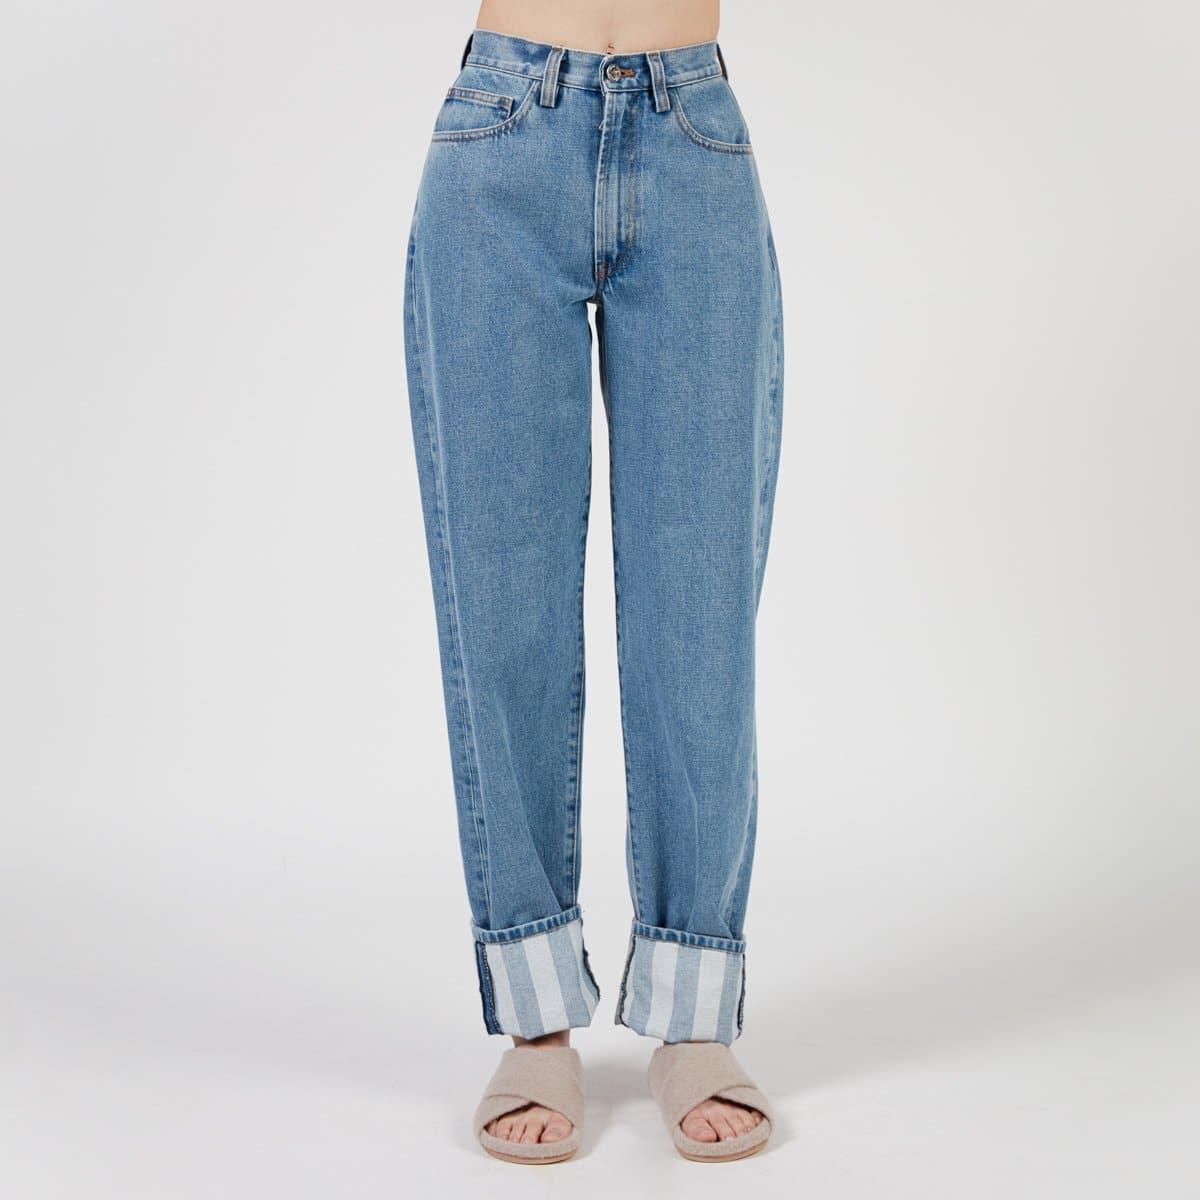 Sunnei Classic Denim Pants